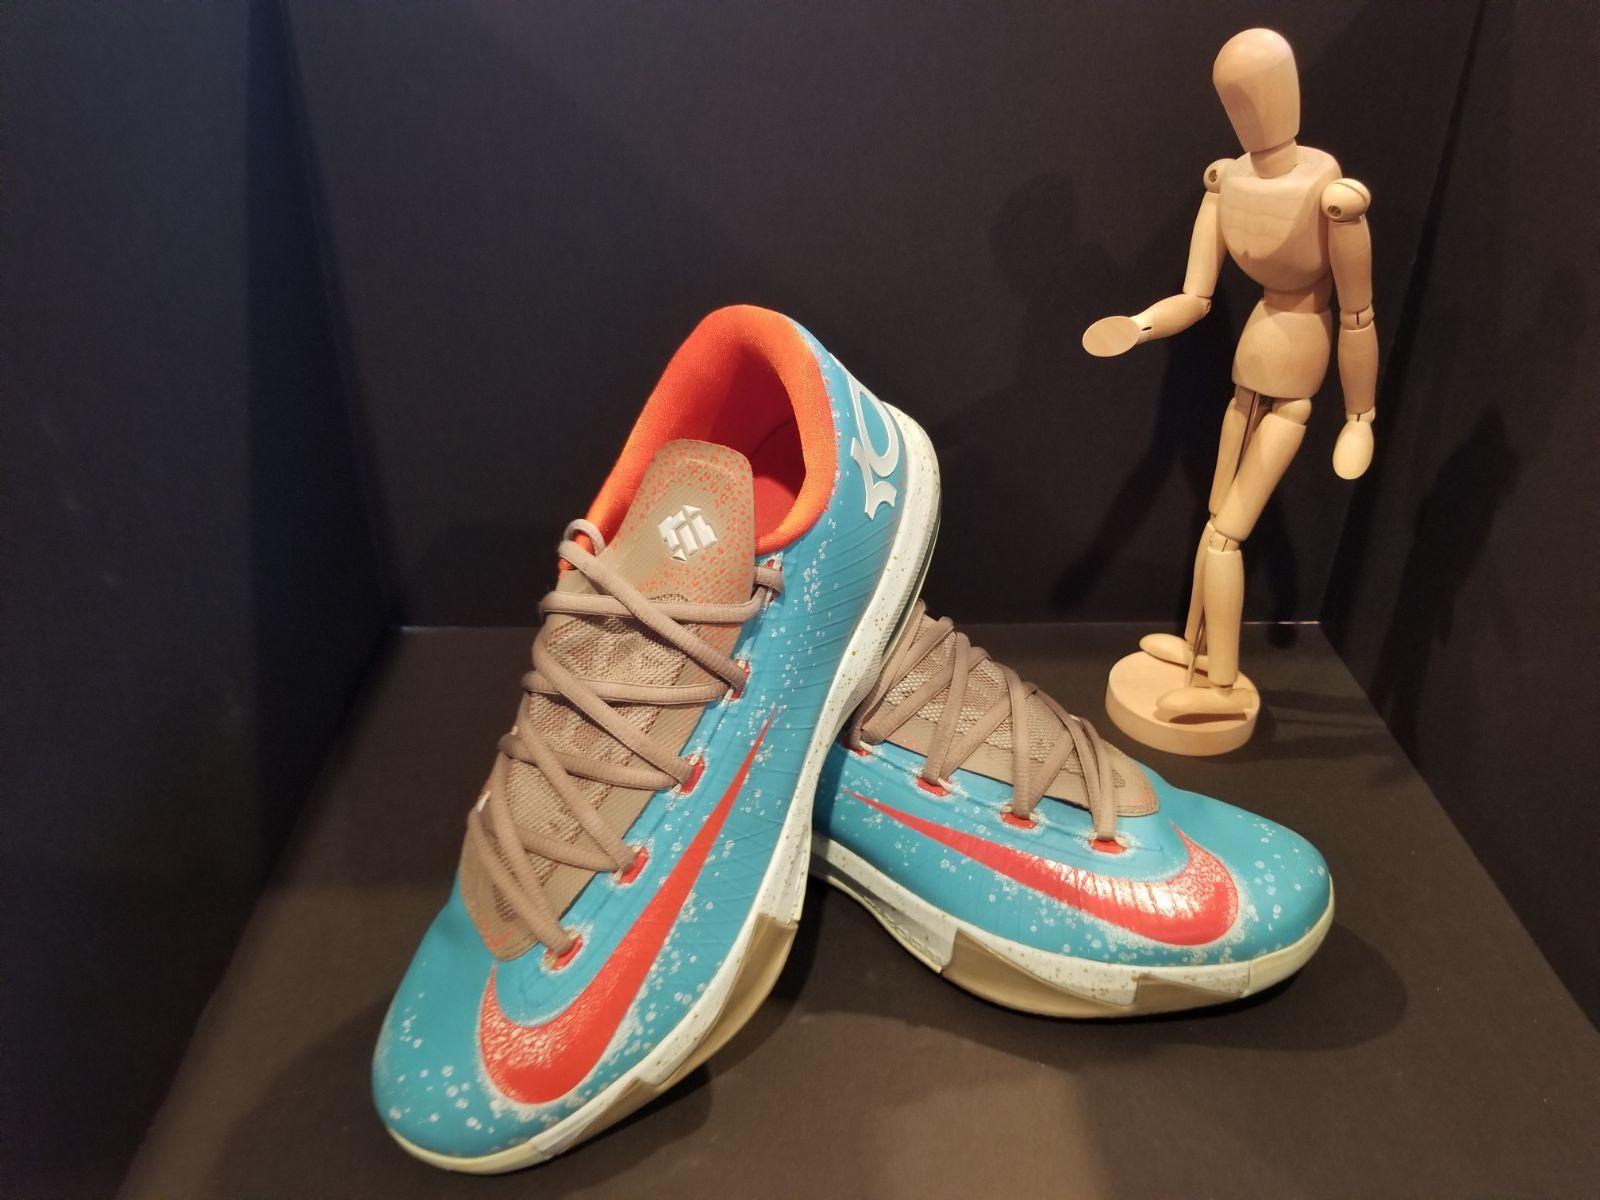 898dccad5710 Nike KD VI Maryland Blue Crab Gamma Gray Gold 599424-400 Men s Size 11 No  Box